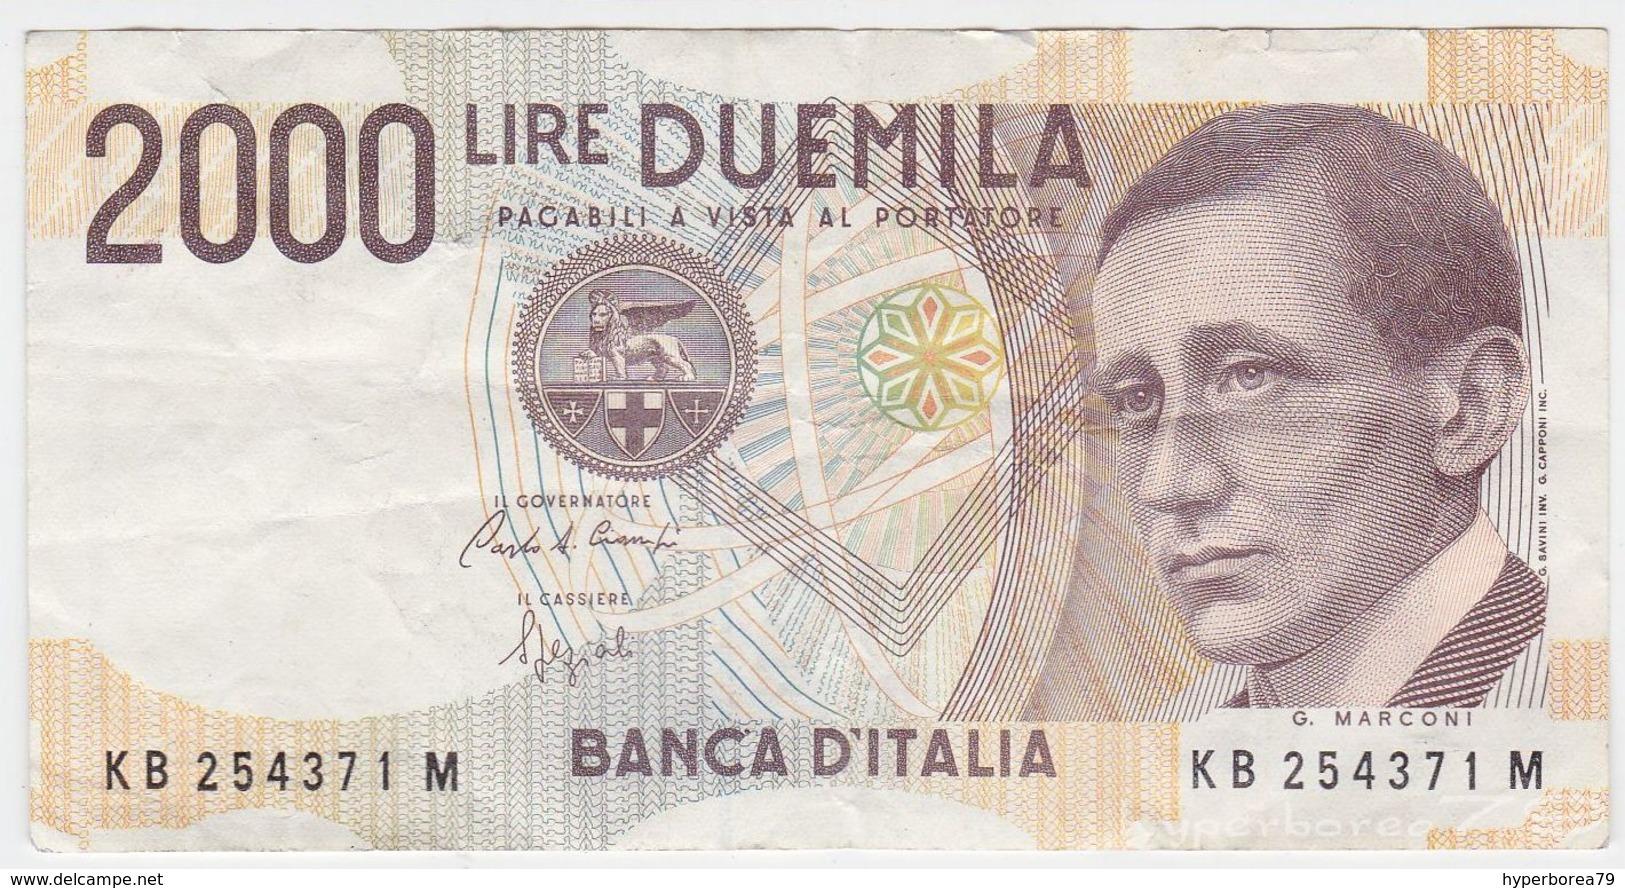 Italy P 115 - 2000 2.000 Lire 3.10.1990 - VF - 2000 Lire